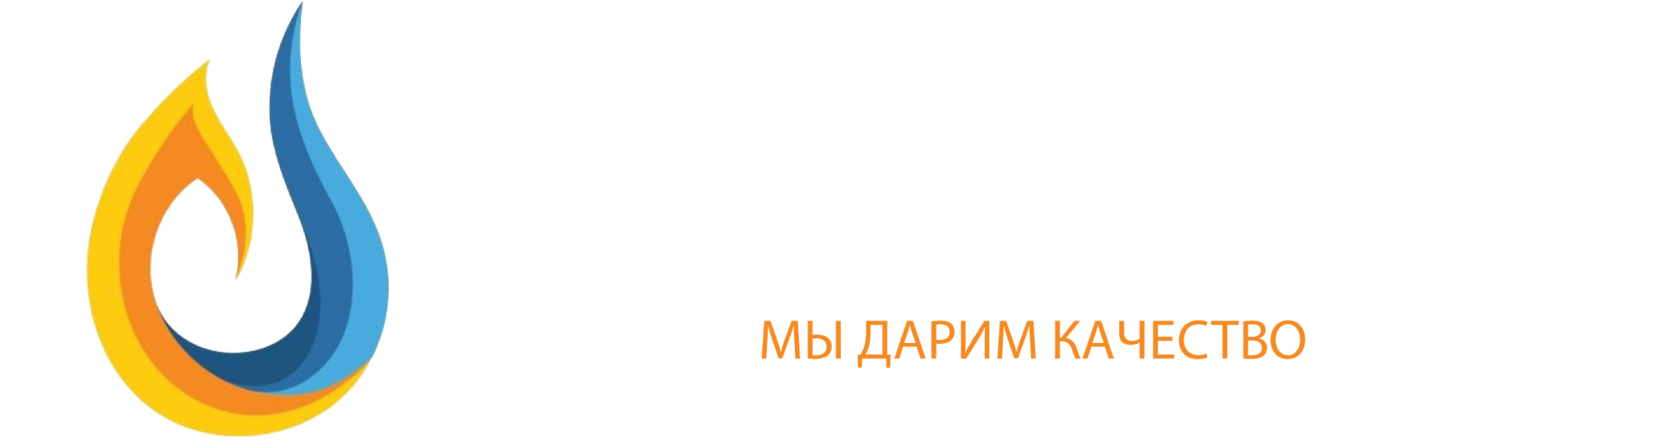 МО ИНЖИНИРИНГ